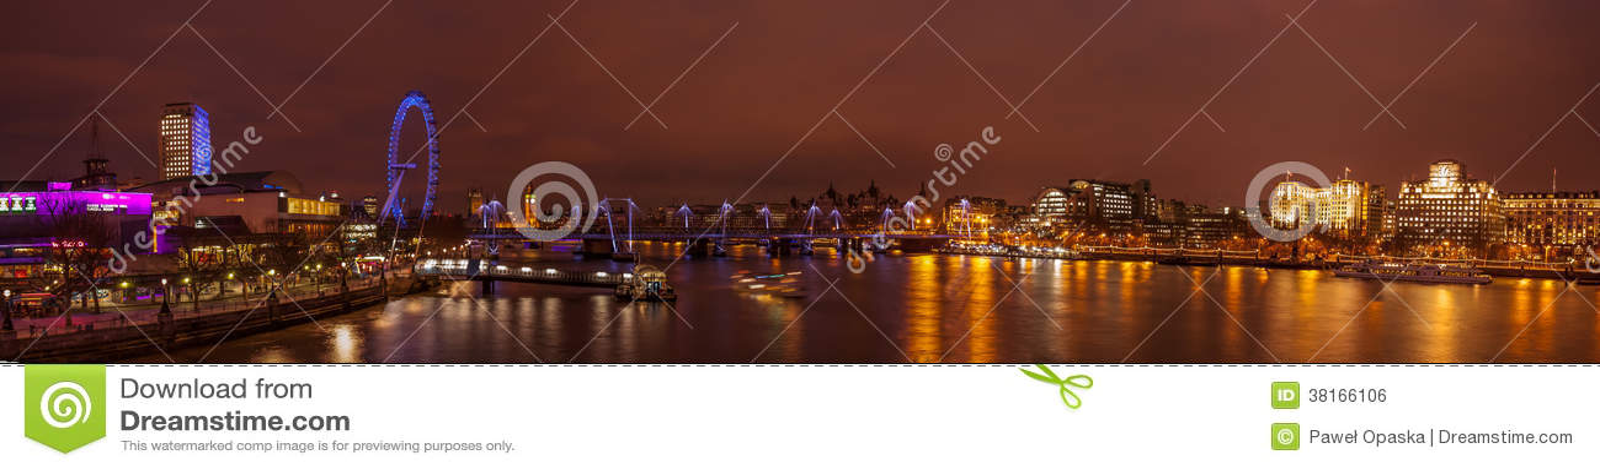 London panorama at night